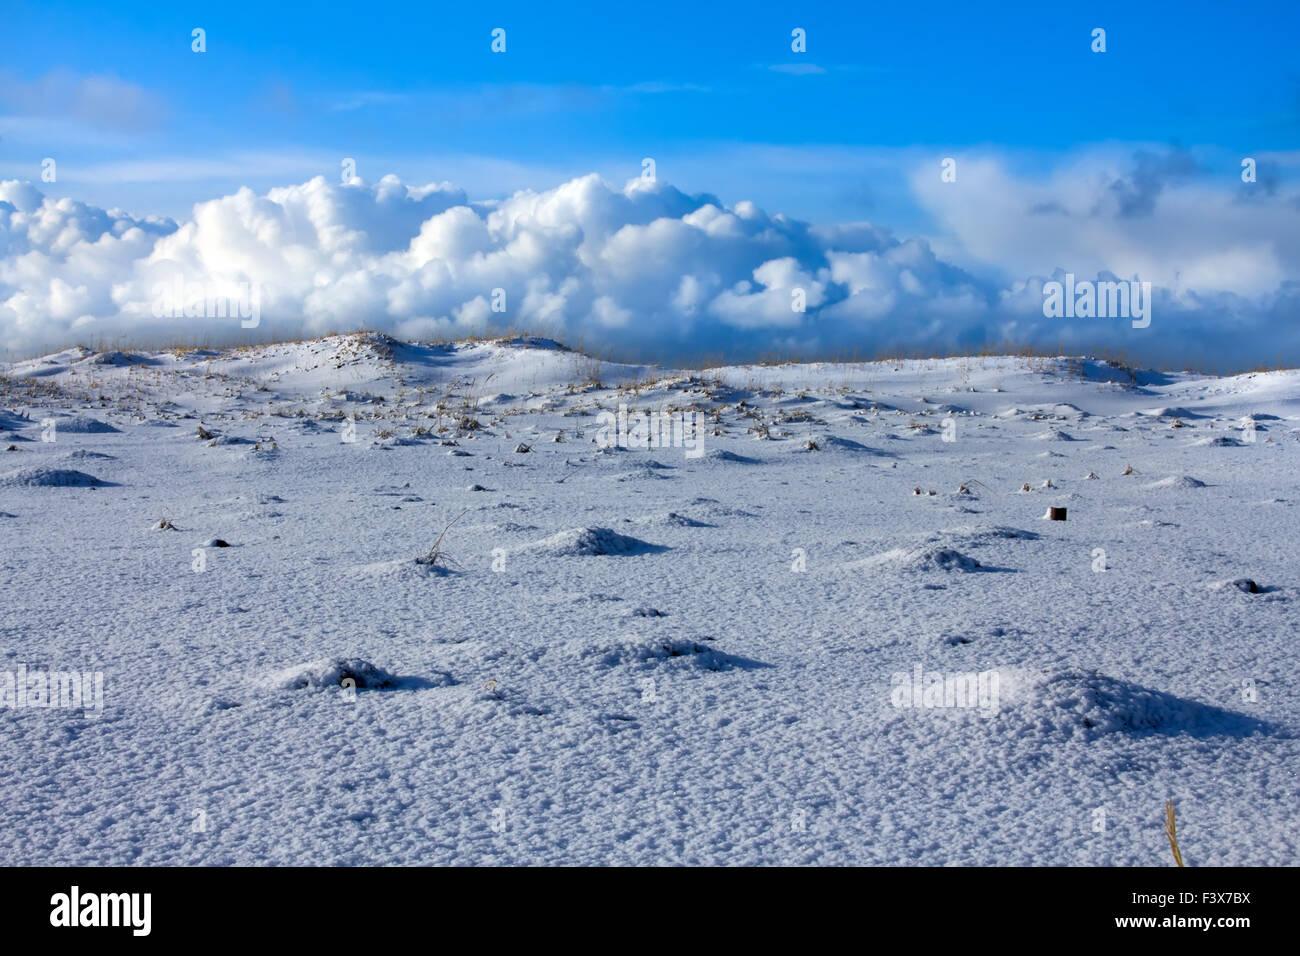 Snow distances 3 - Stock Image